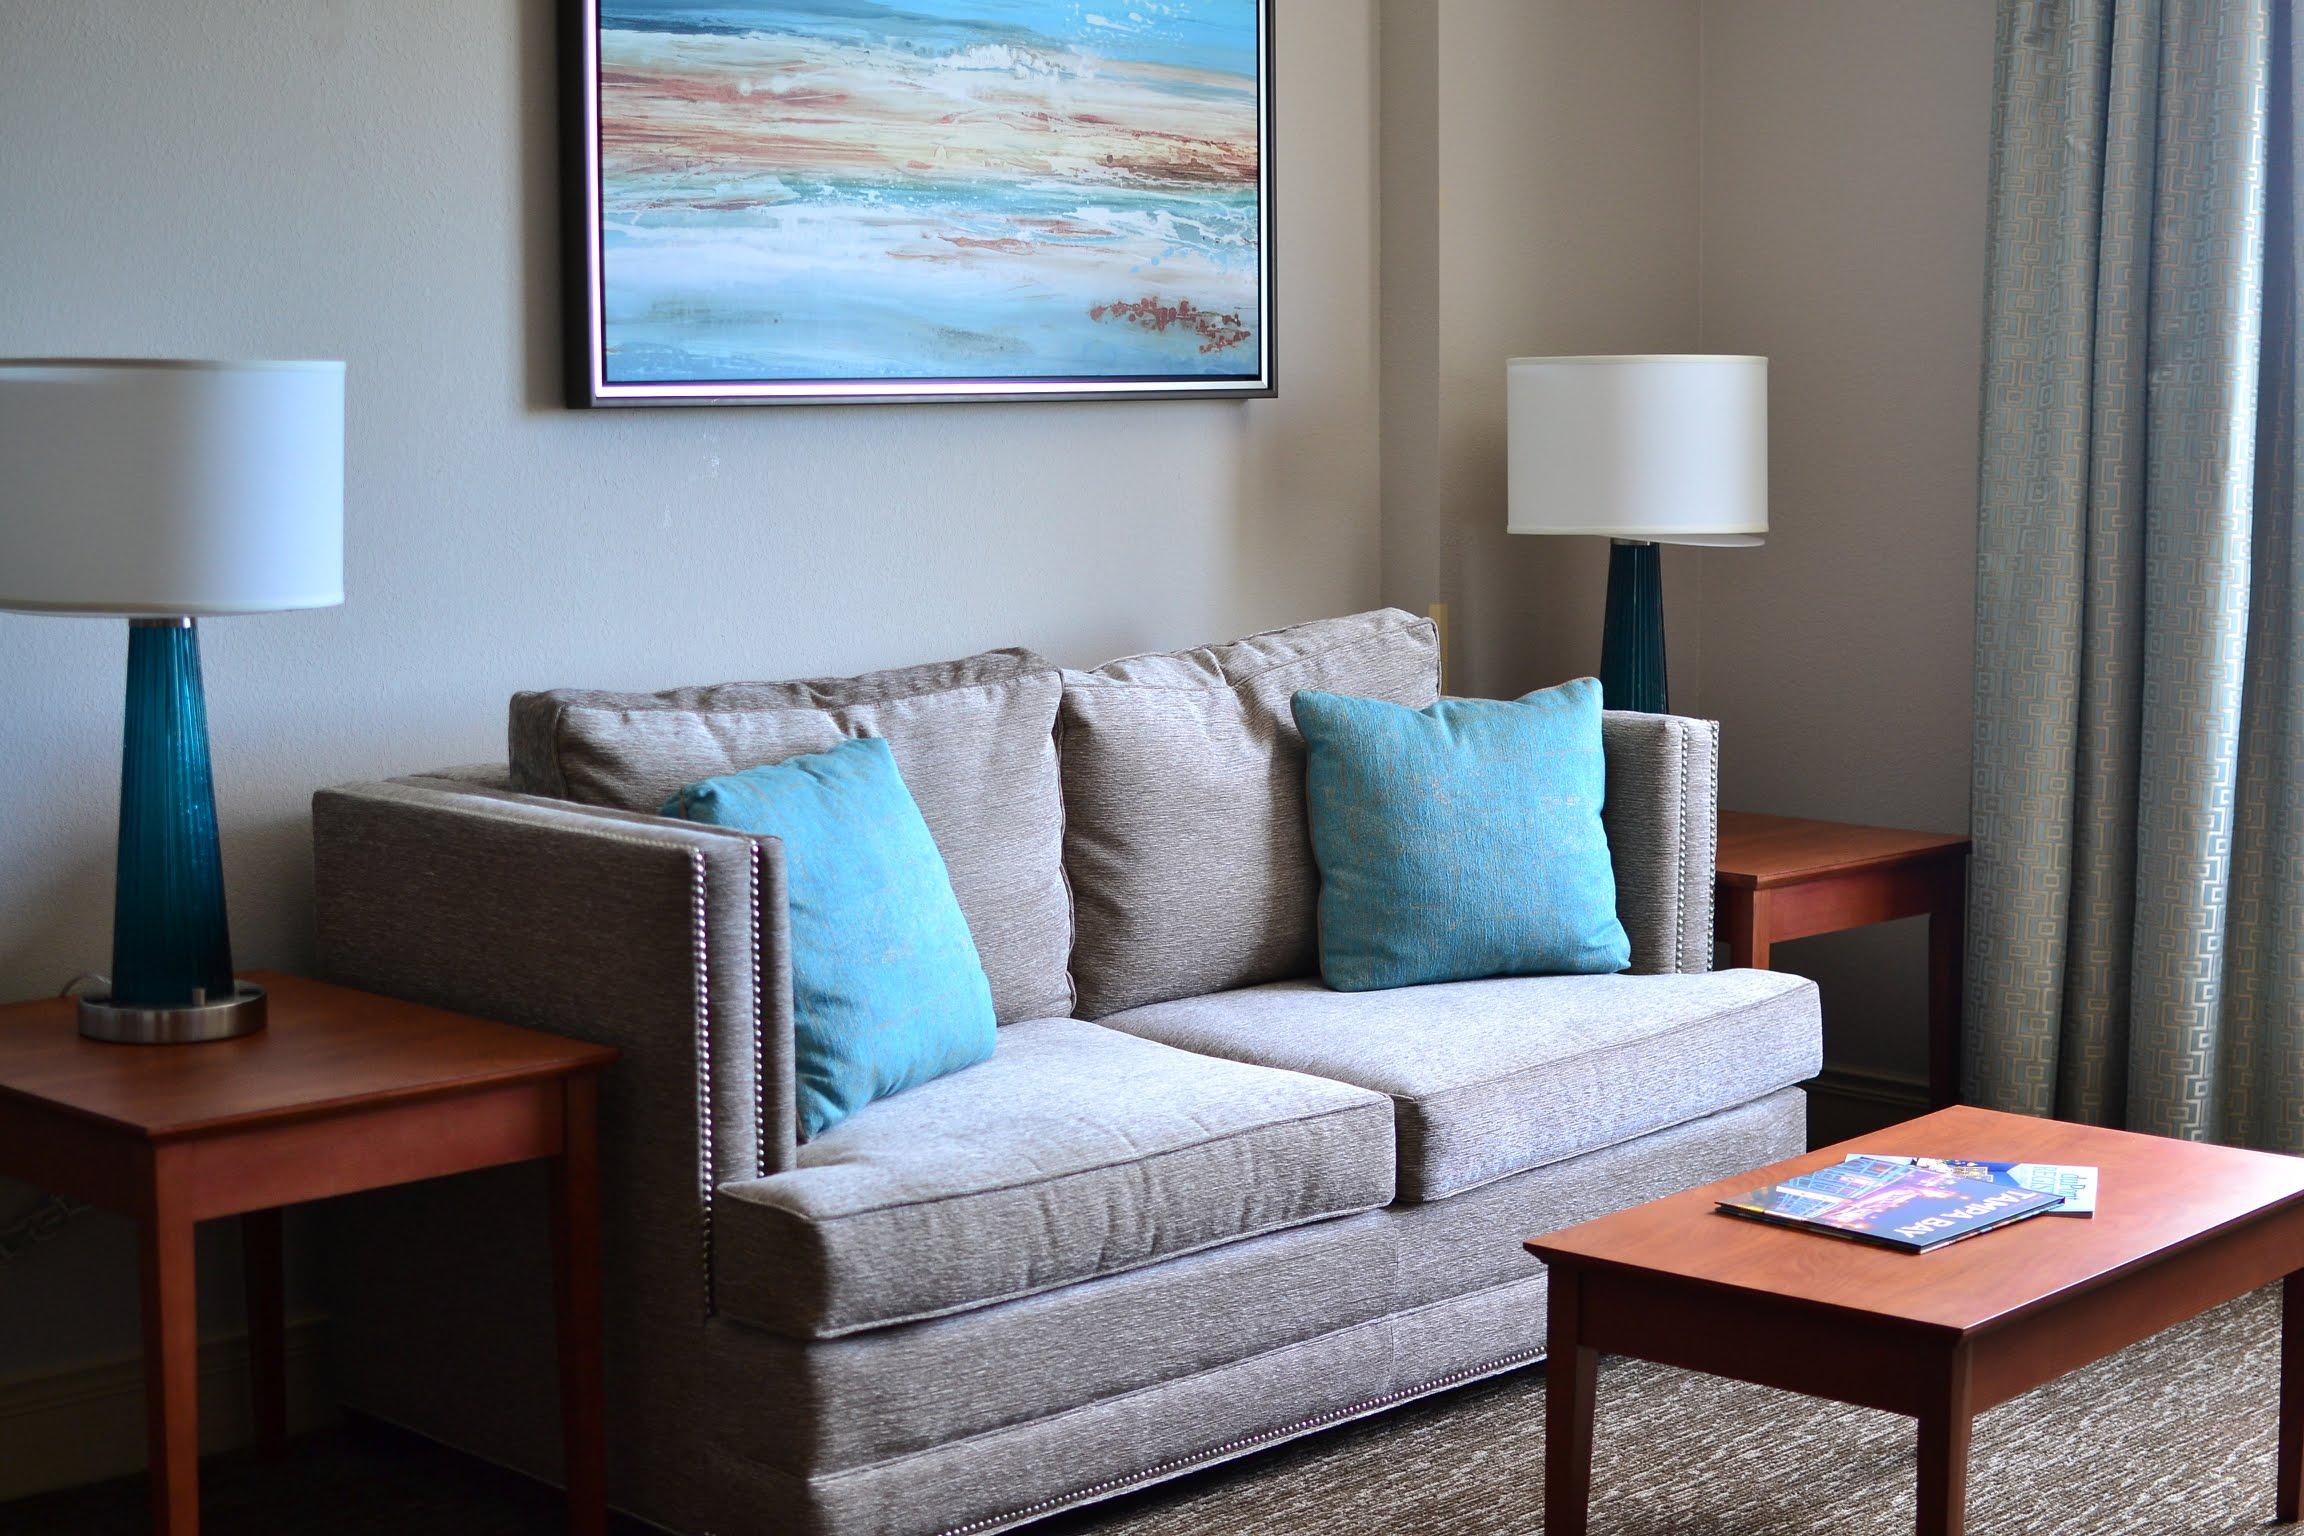 hotel Suite St. Petersburg Florida